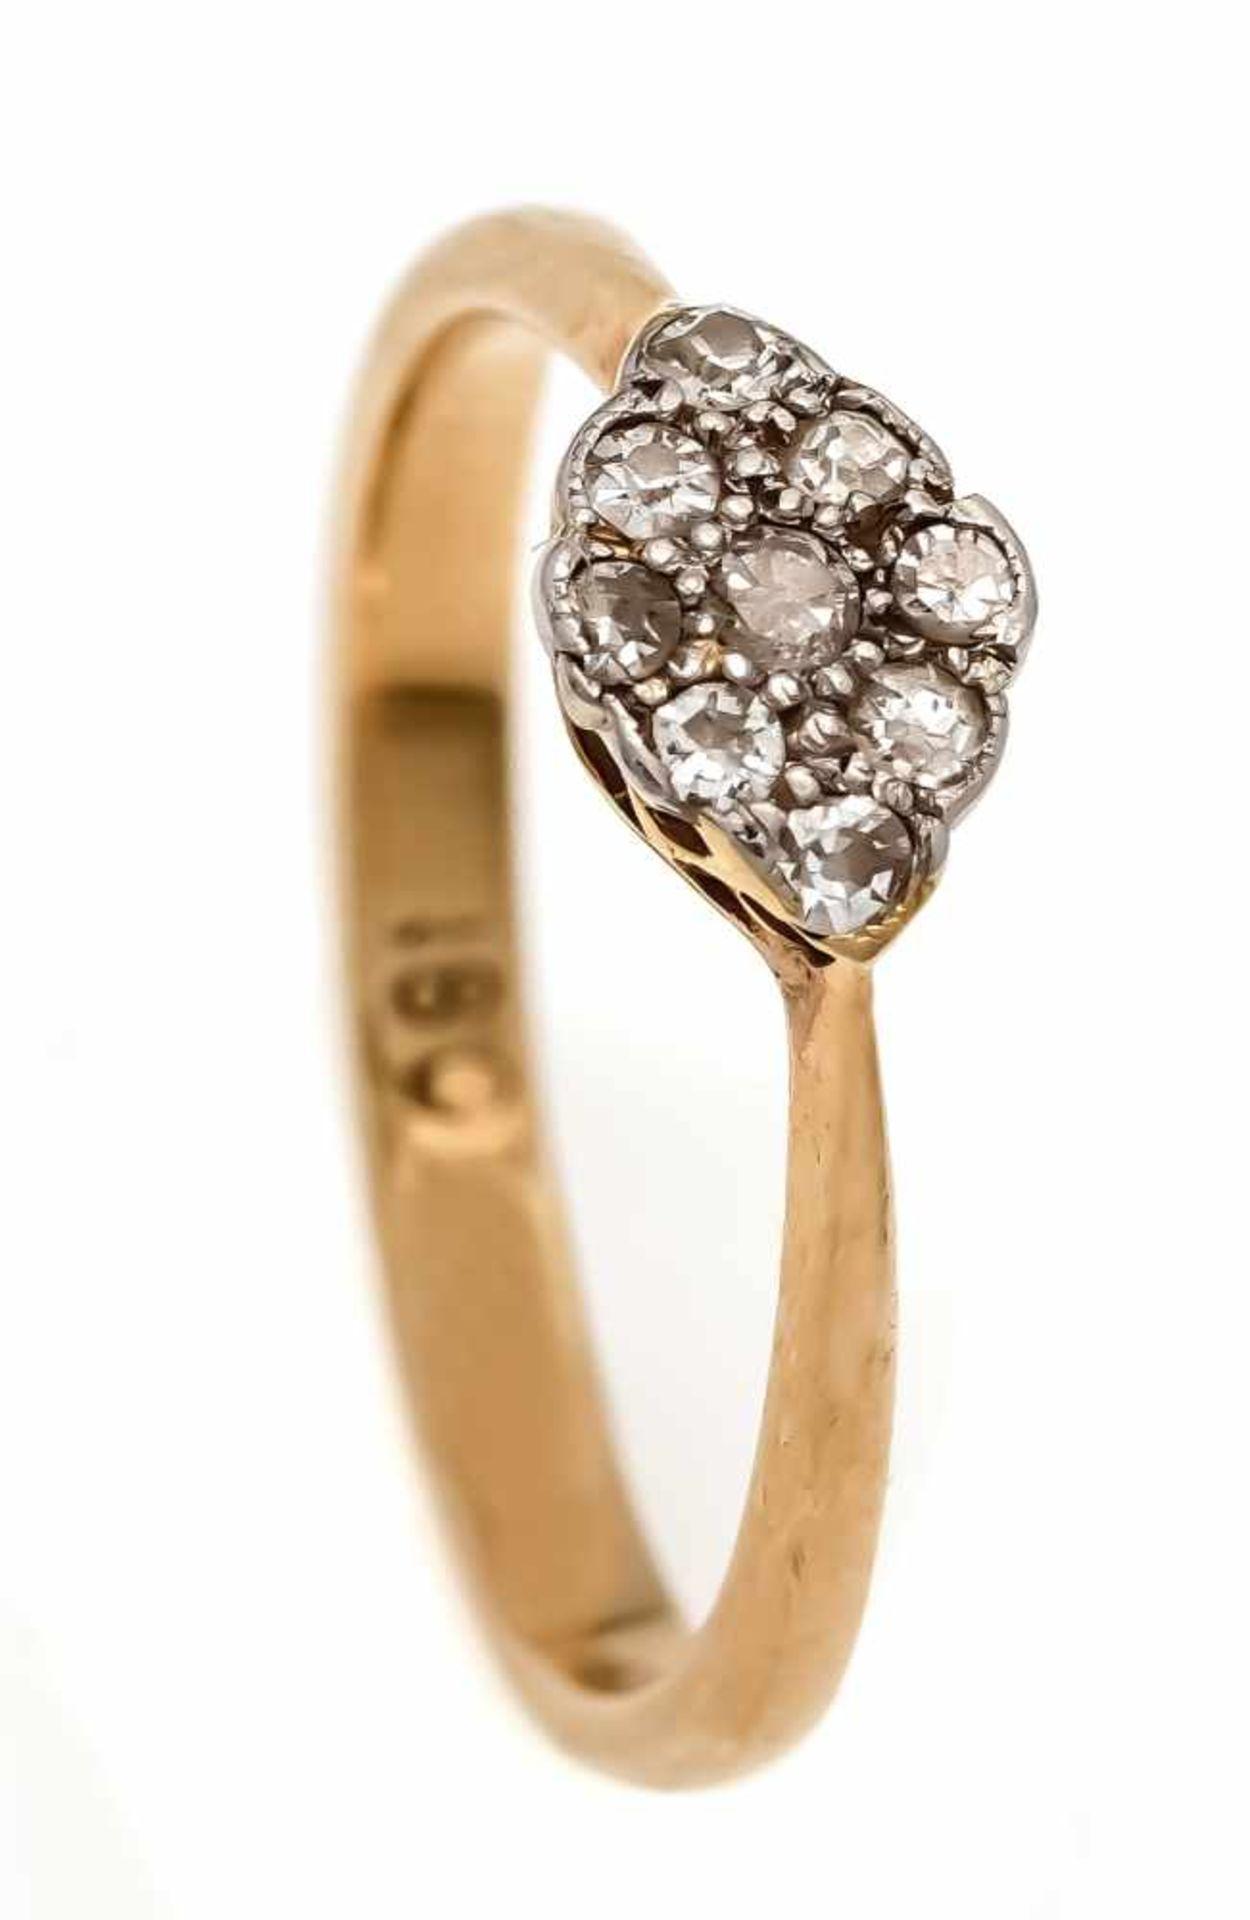 Diamant-Ring GG/WG 750/000 mit Diamanten, zus. 0,12 ct l.get.W-W/SI-PI, RG 51, 2,4 gDiamond ring